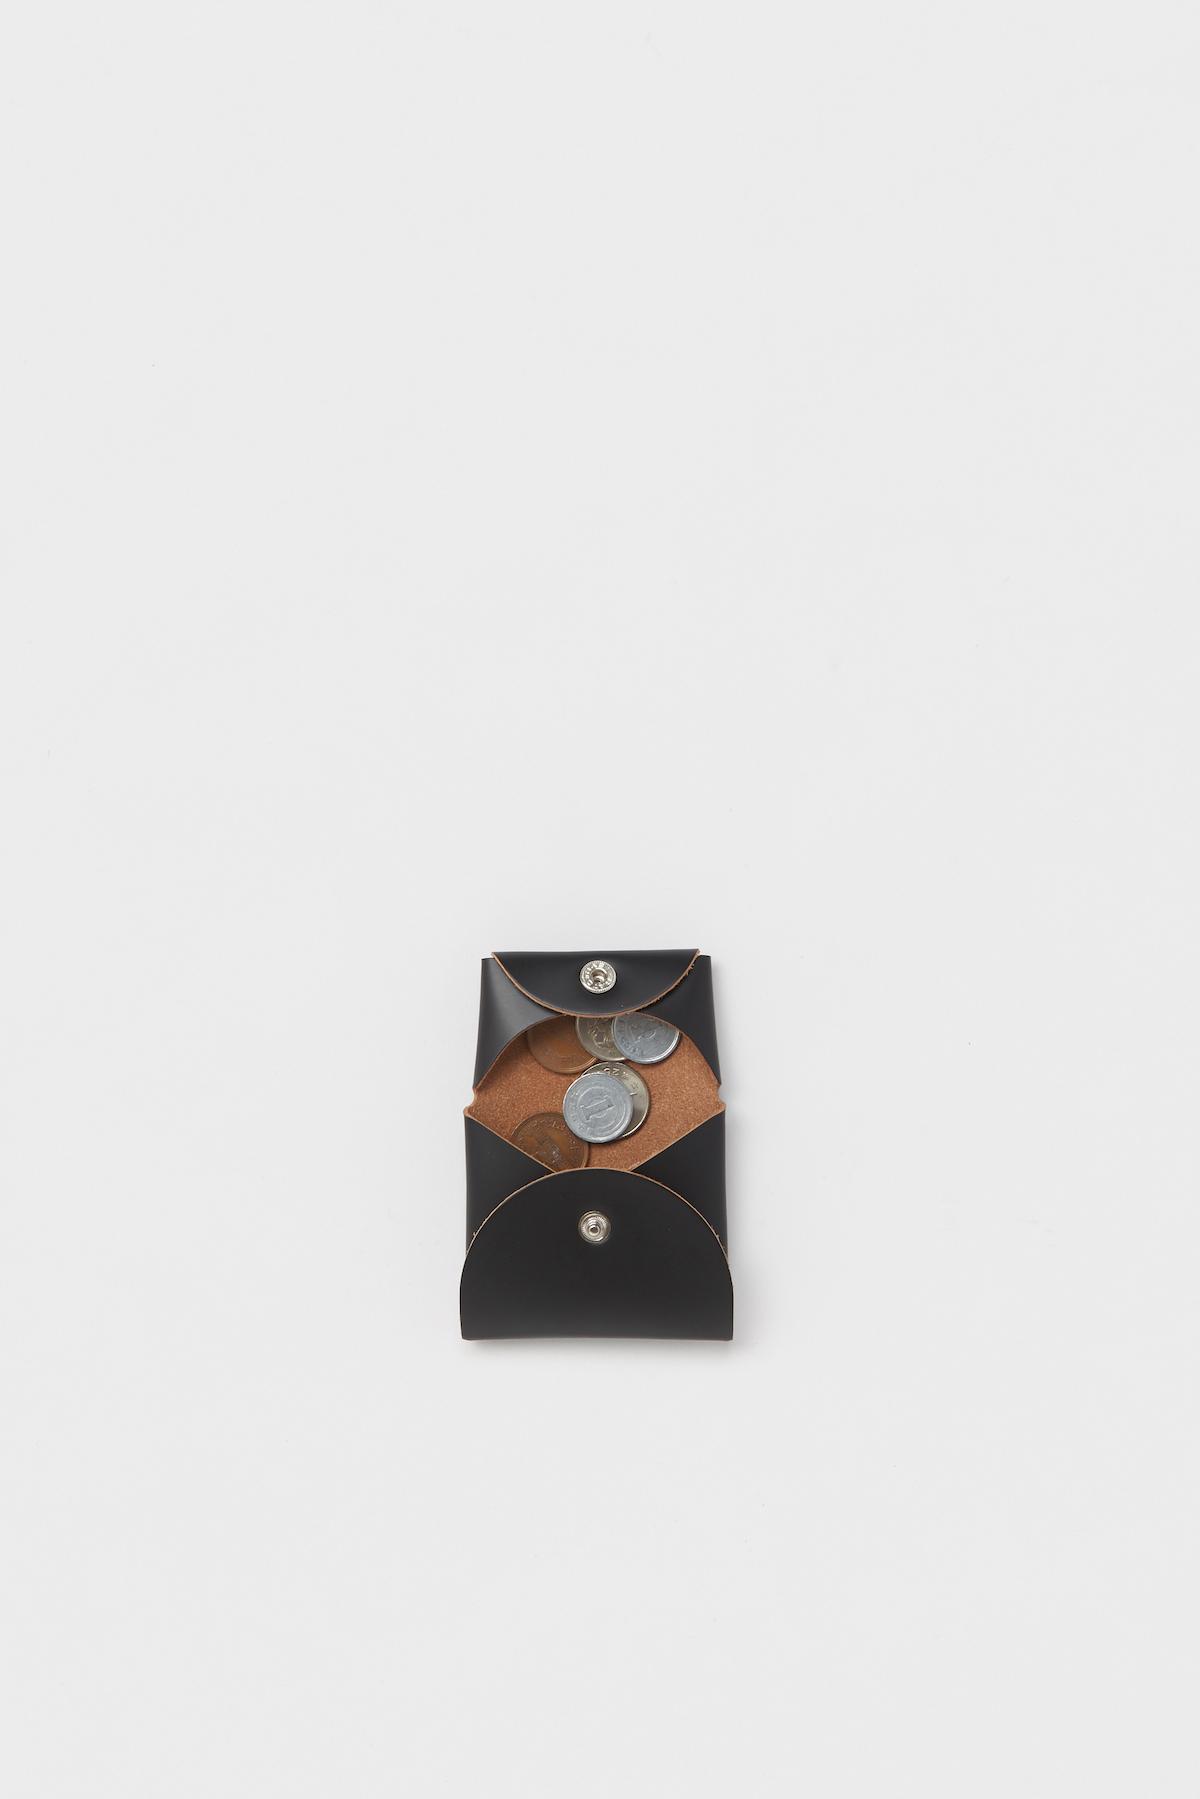 Hender Scheme「assemble coin case / black」